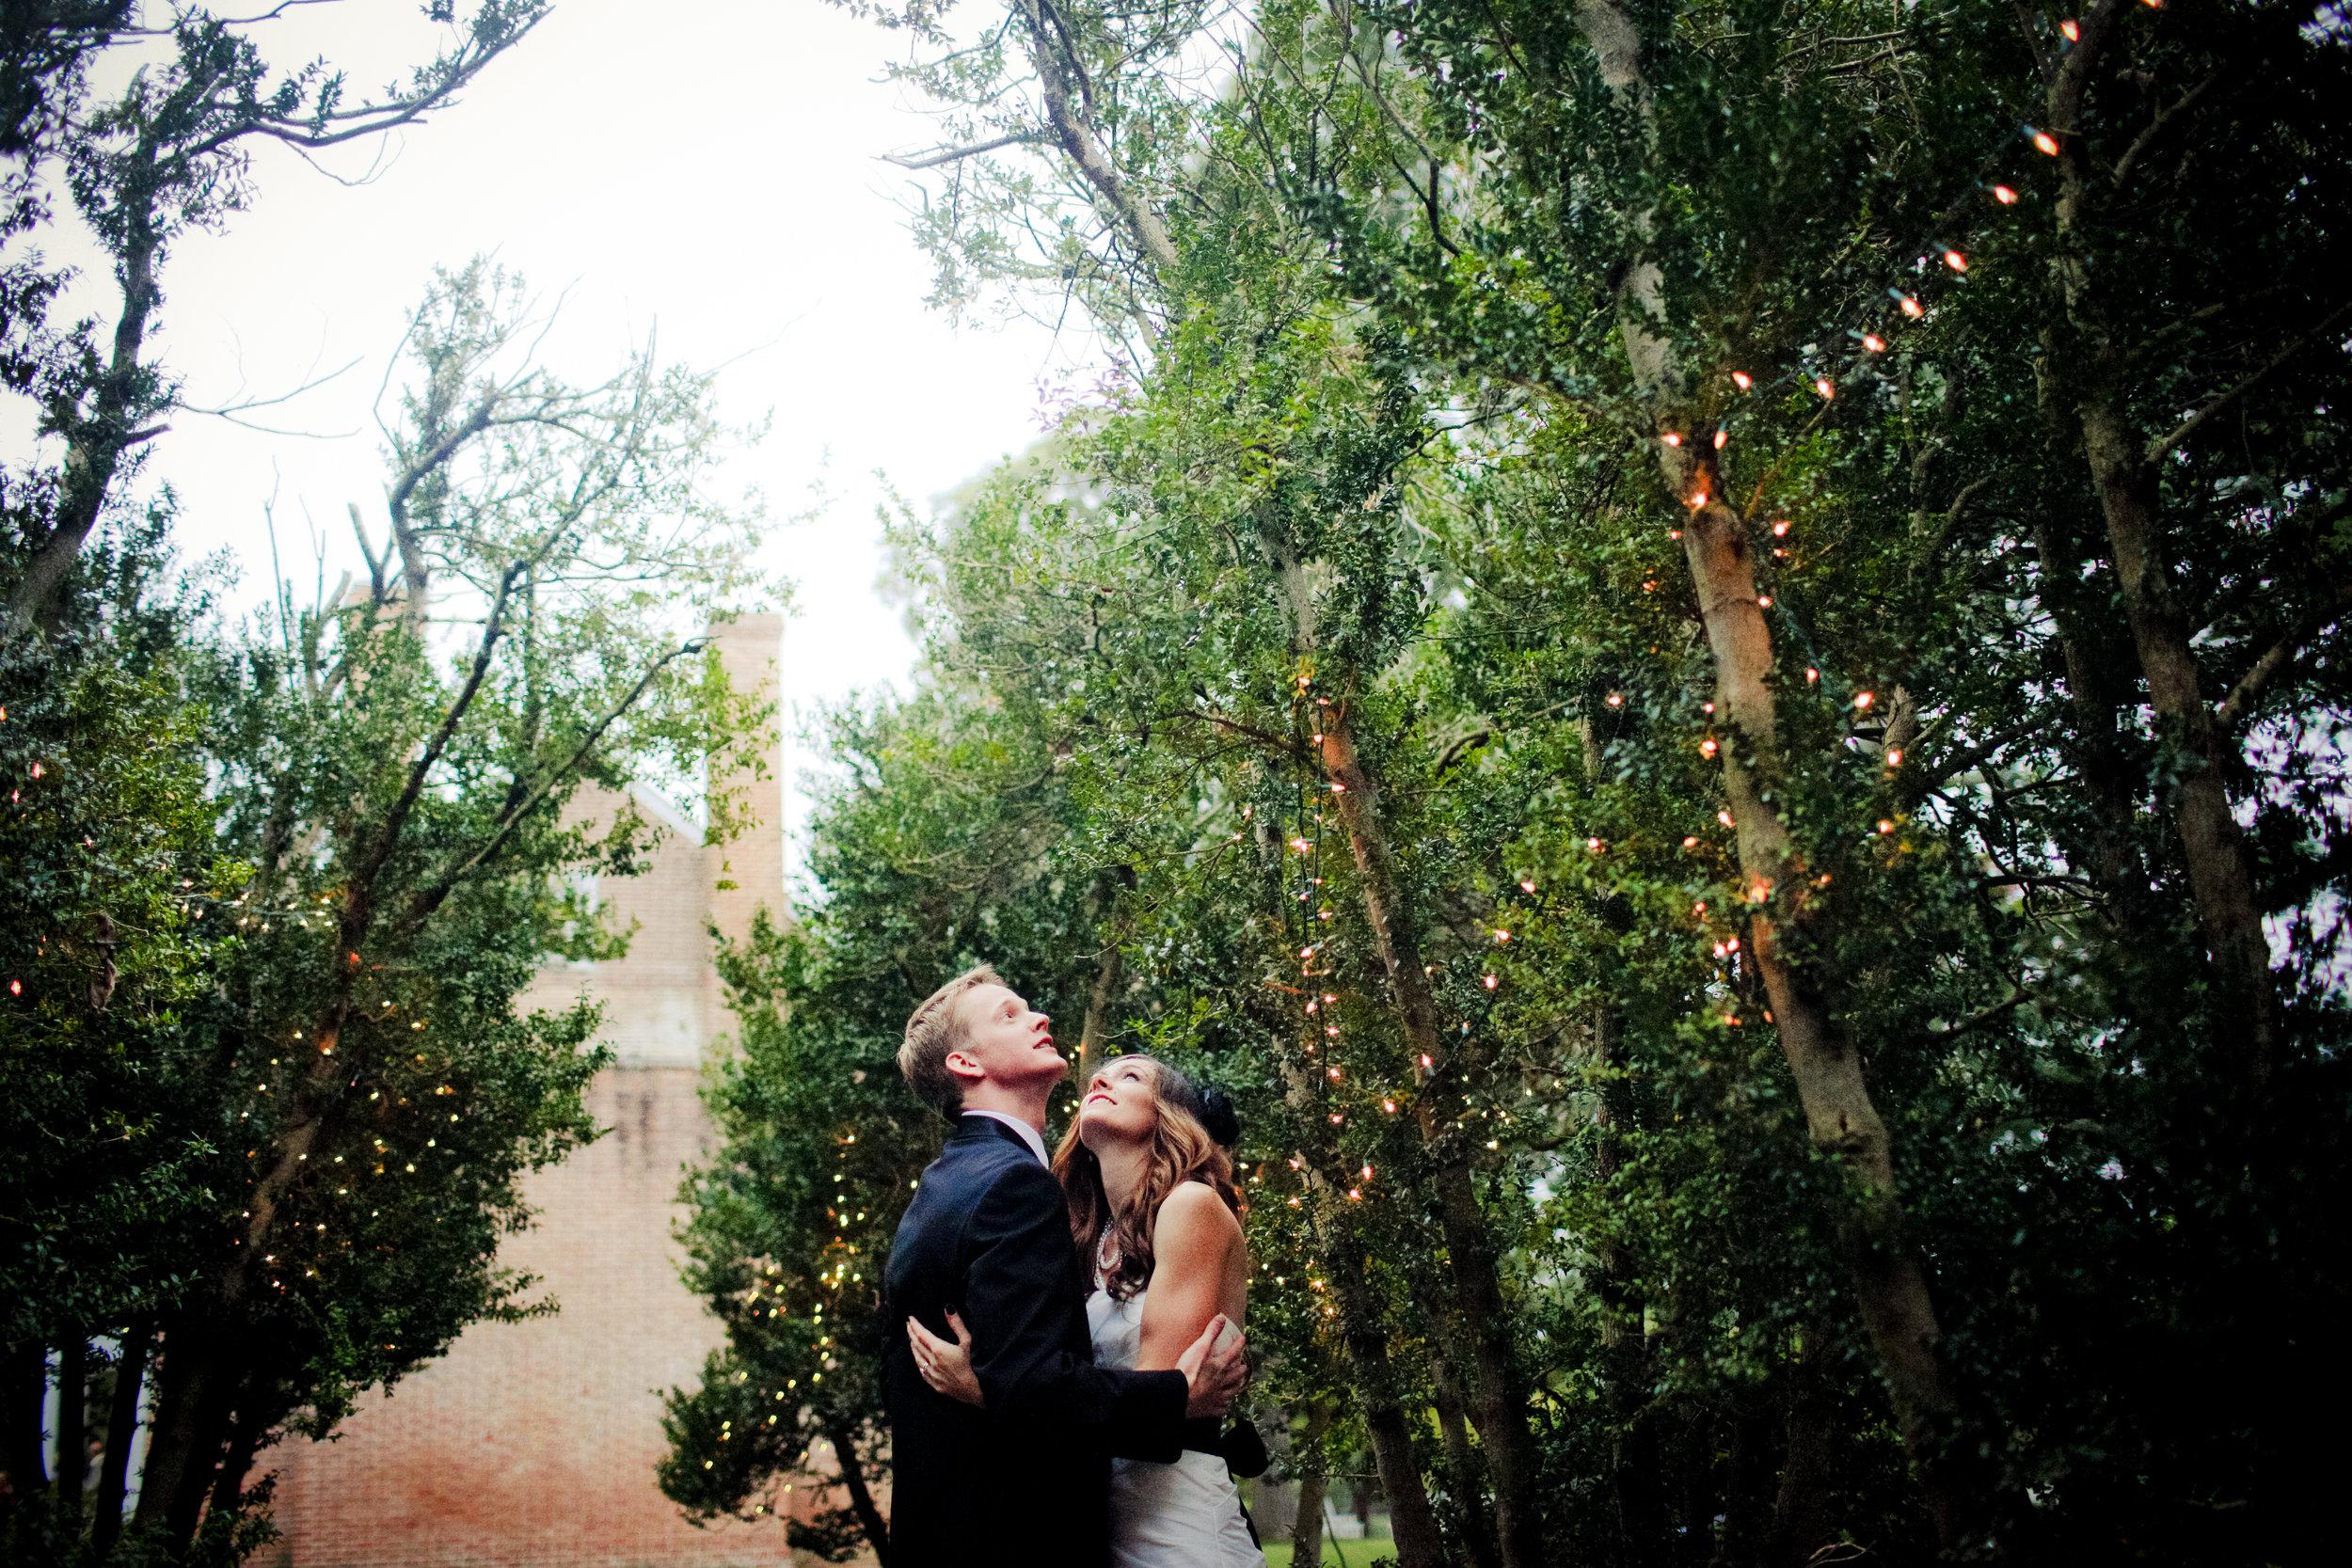 0021_100712 159 metcalf wedding edited.JPG